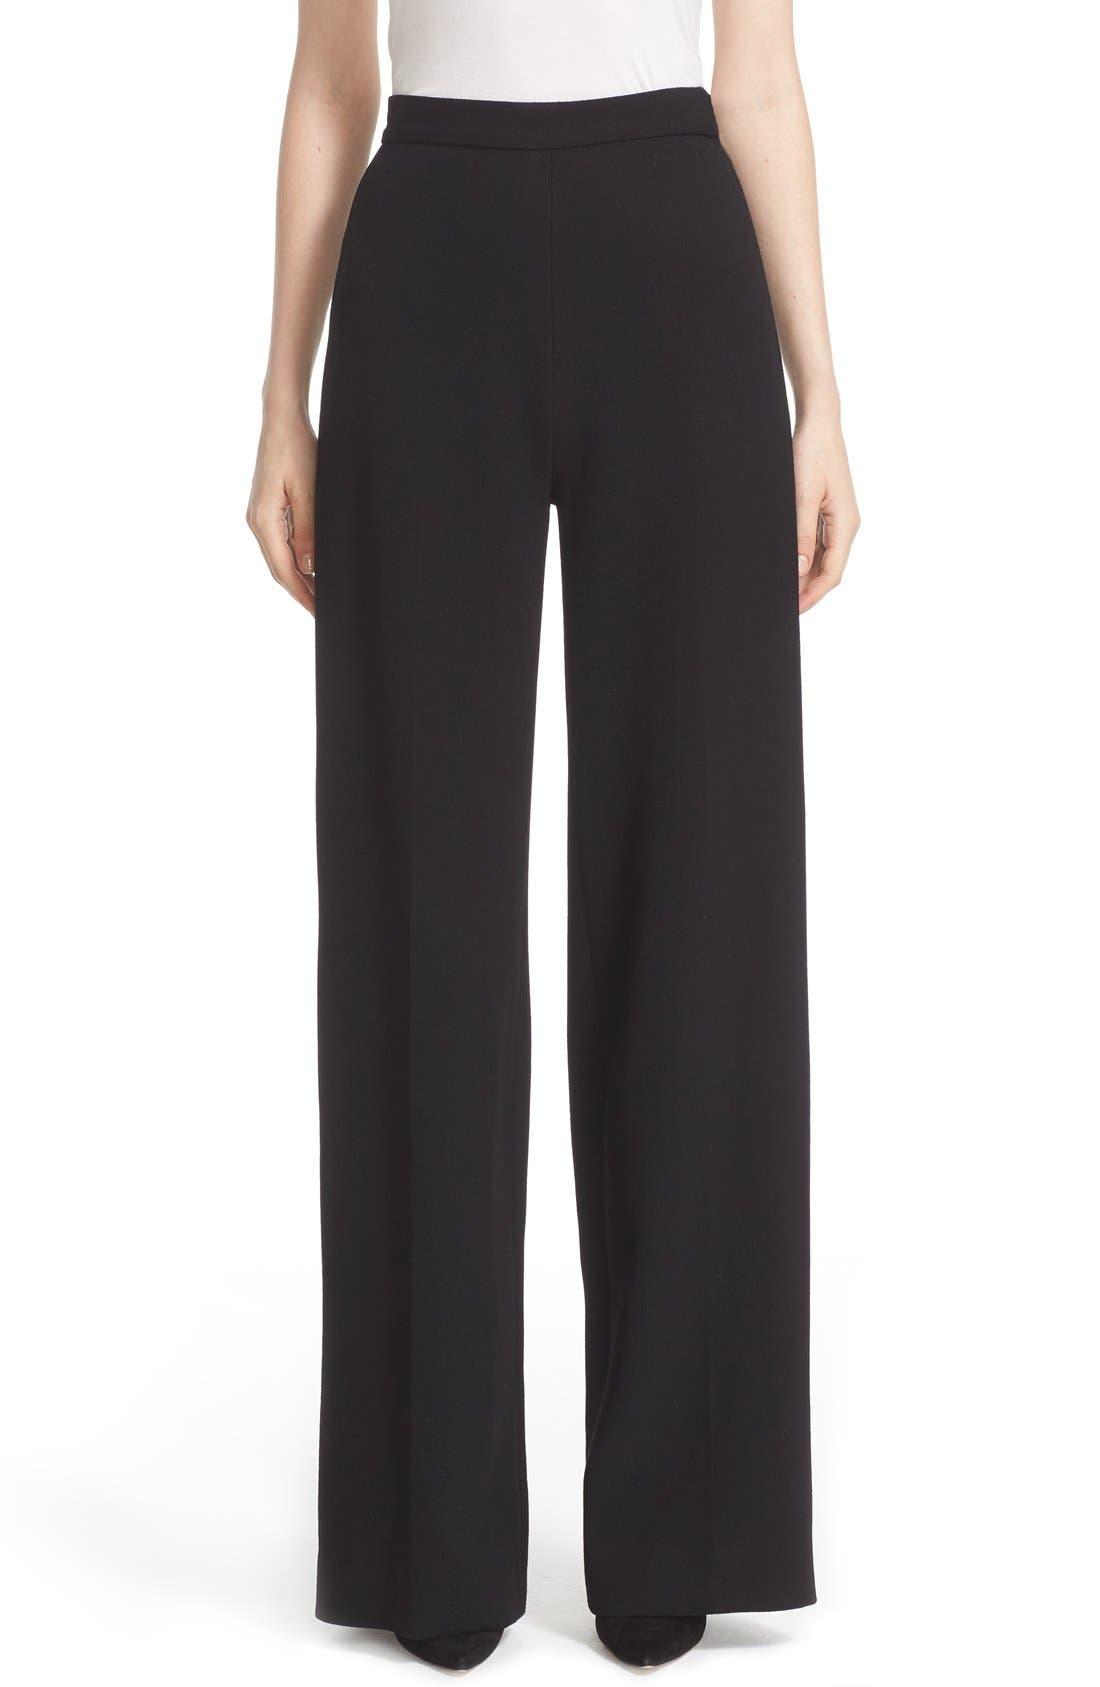 Main Image - Lela Rose Stretch Wool High Waist Pants